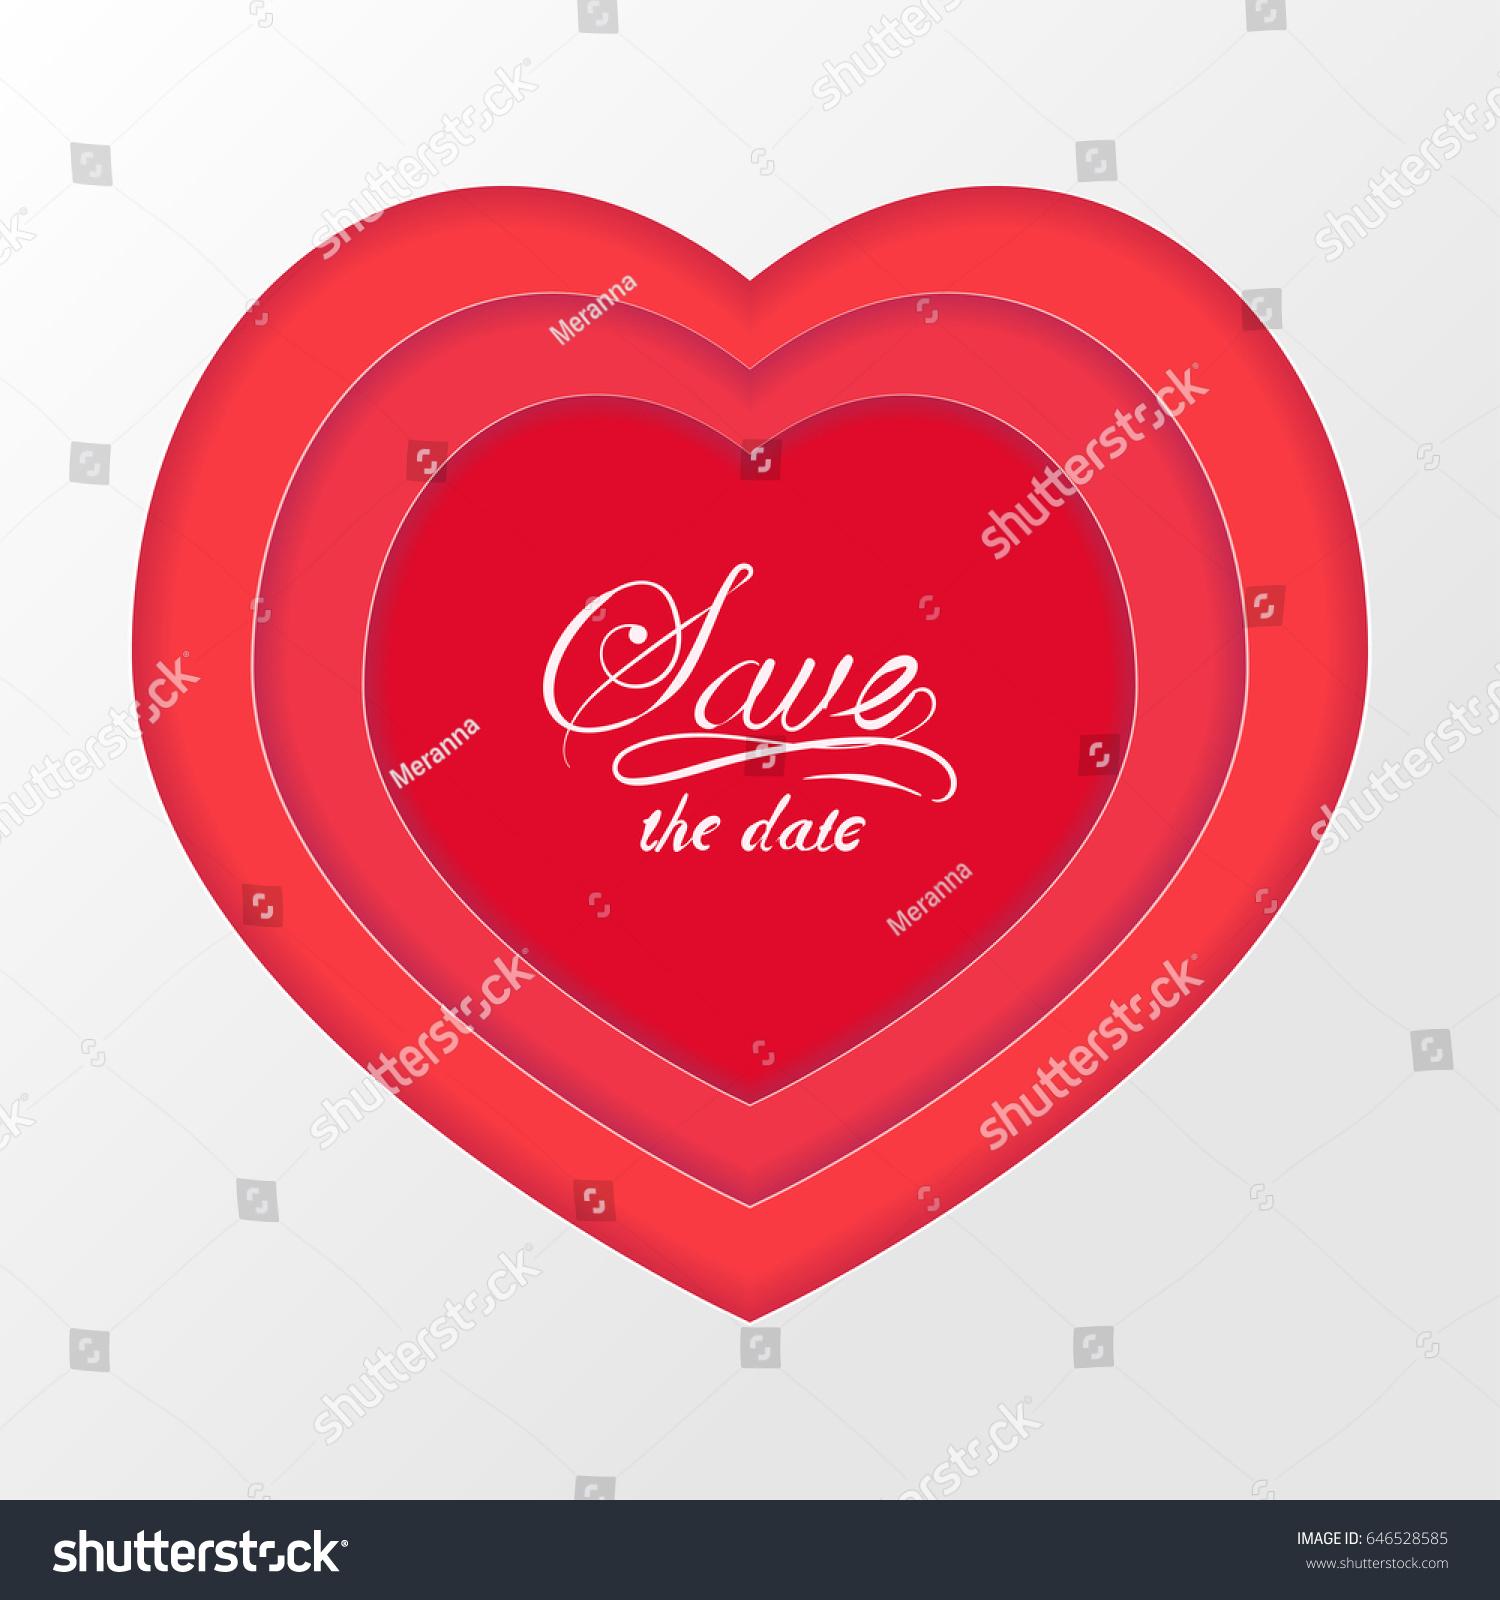 Red Volumetric Paper Cut Heart Valentines Stock Vector 646528585 ...